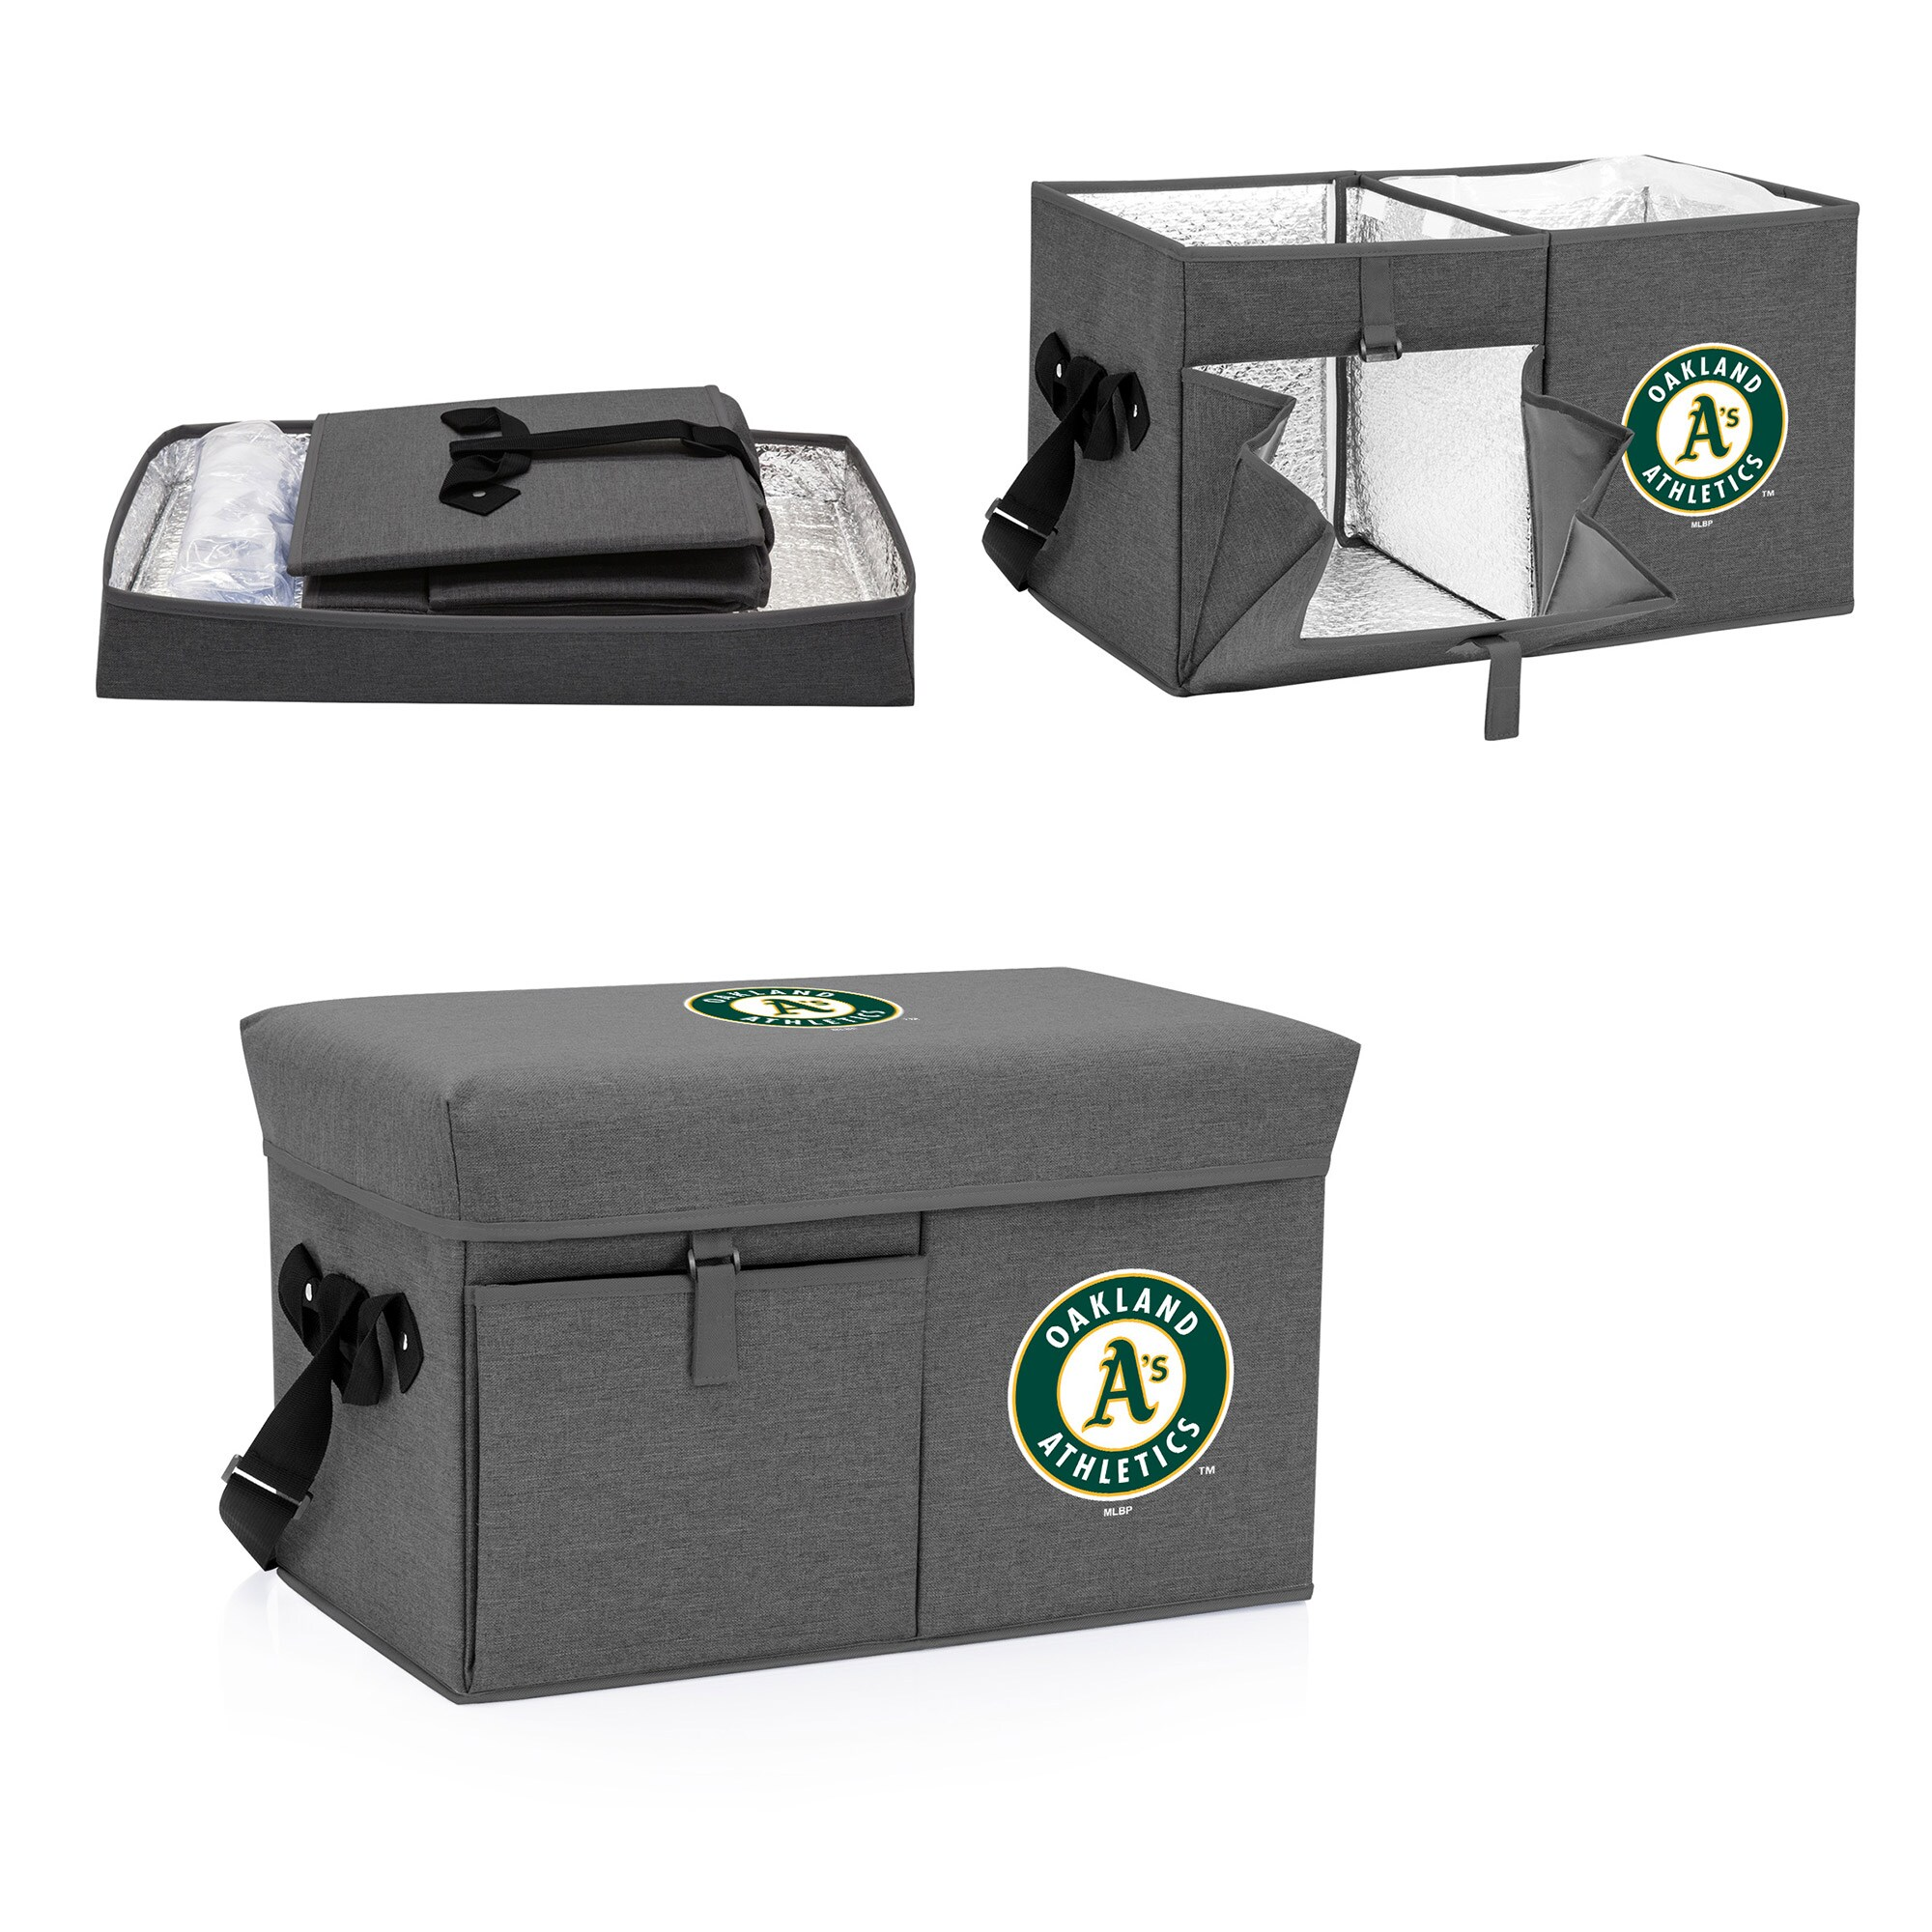 Oakland Athletics Ottoman Cooler & Seat - Gray